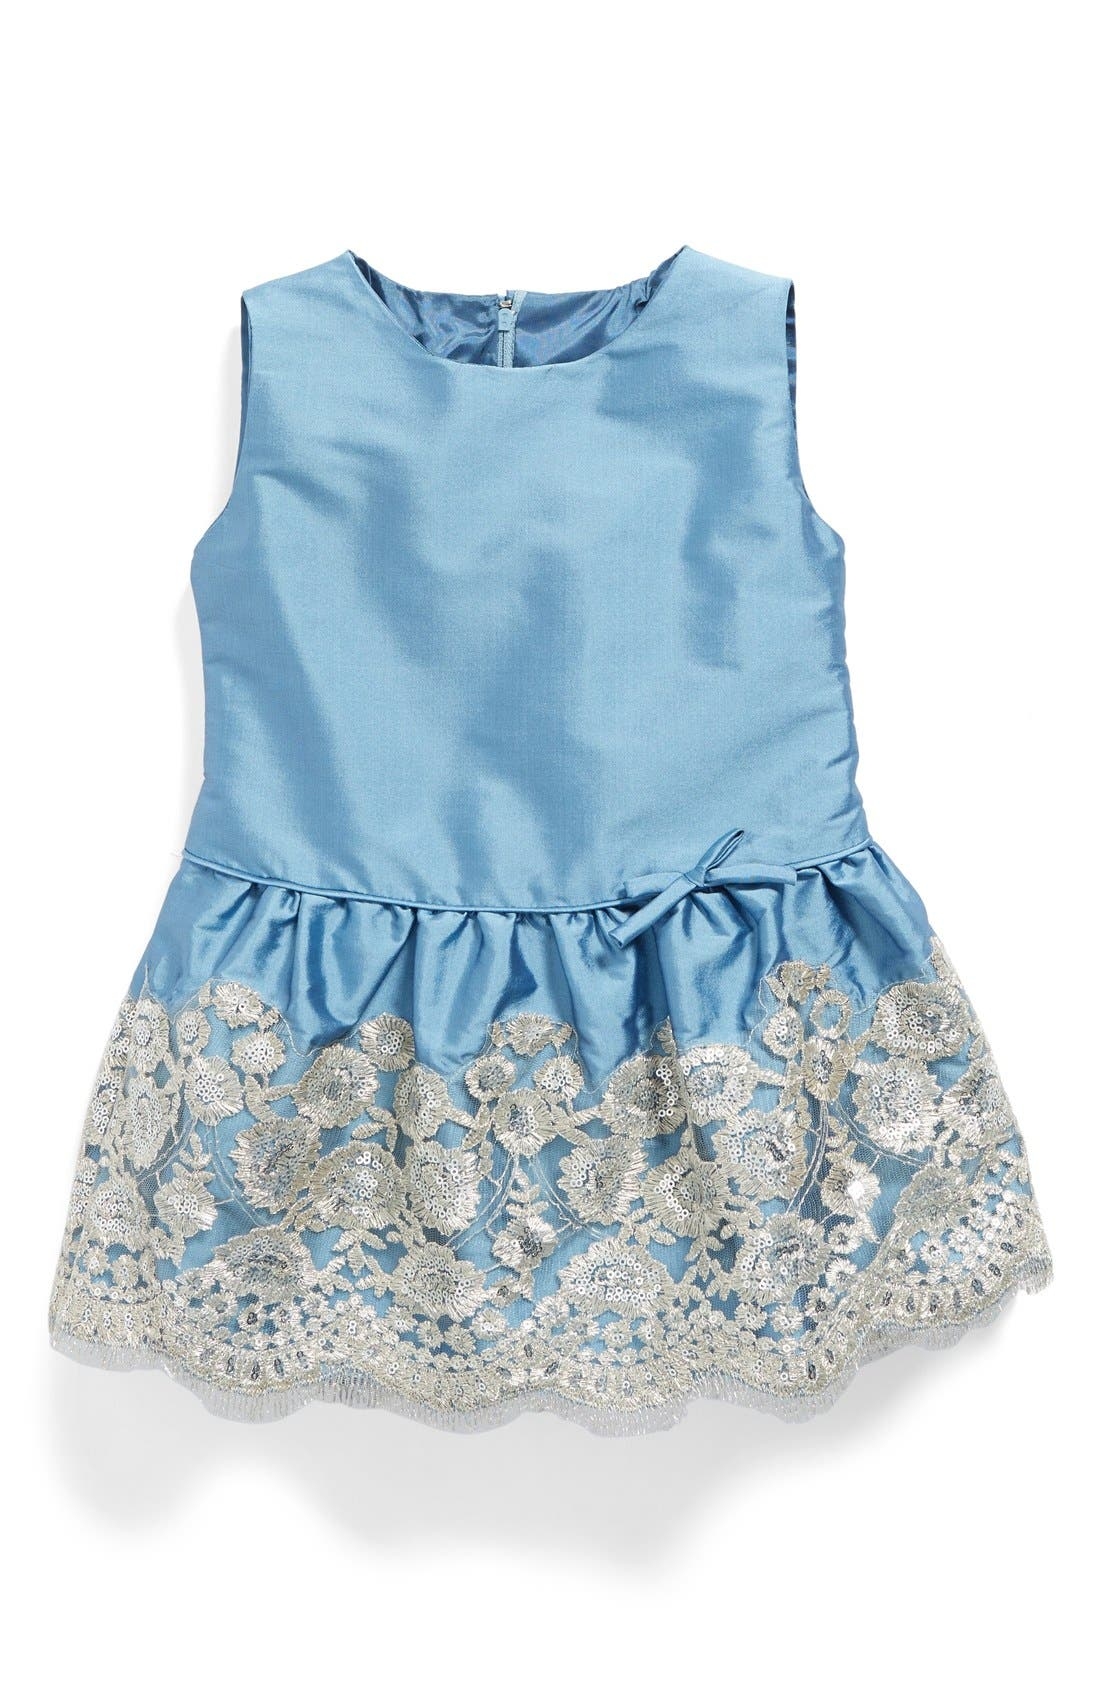 Main Image - Isabel GarretonDrop Waist Dress (Toddler Girls, Little Girls & Big Girls)